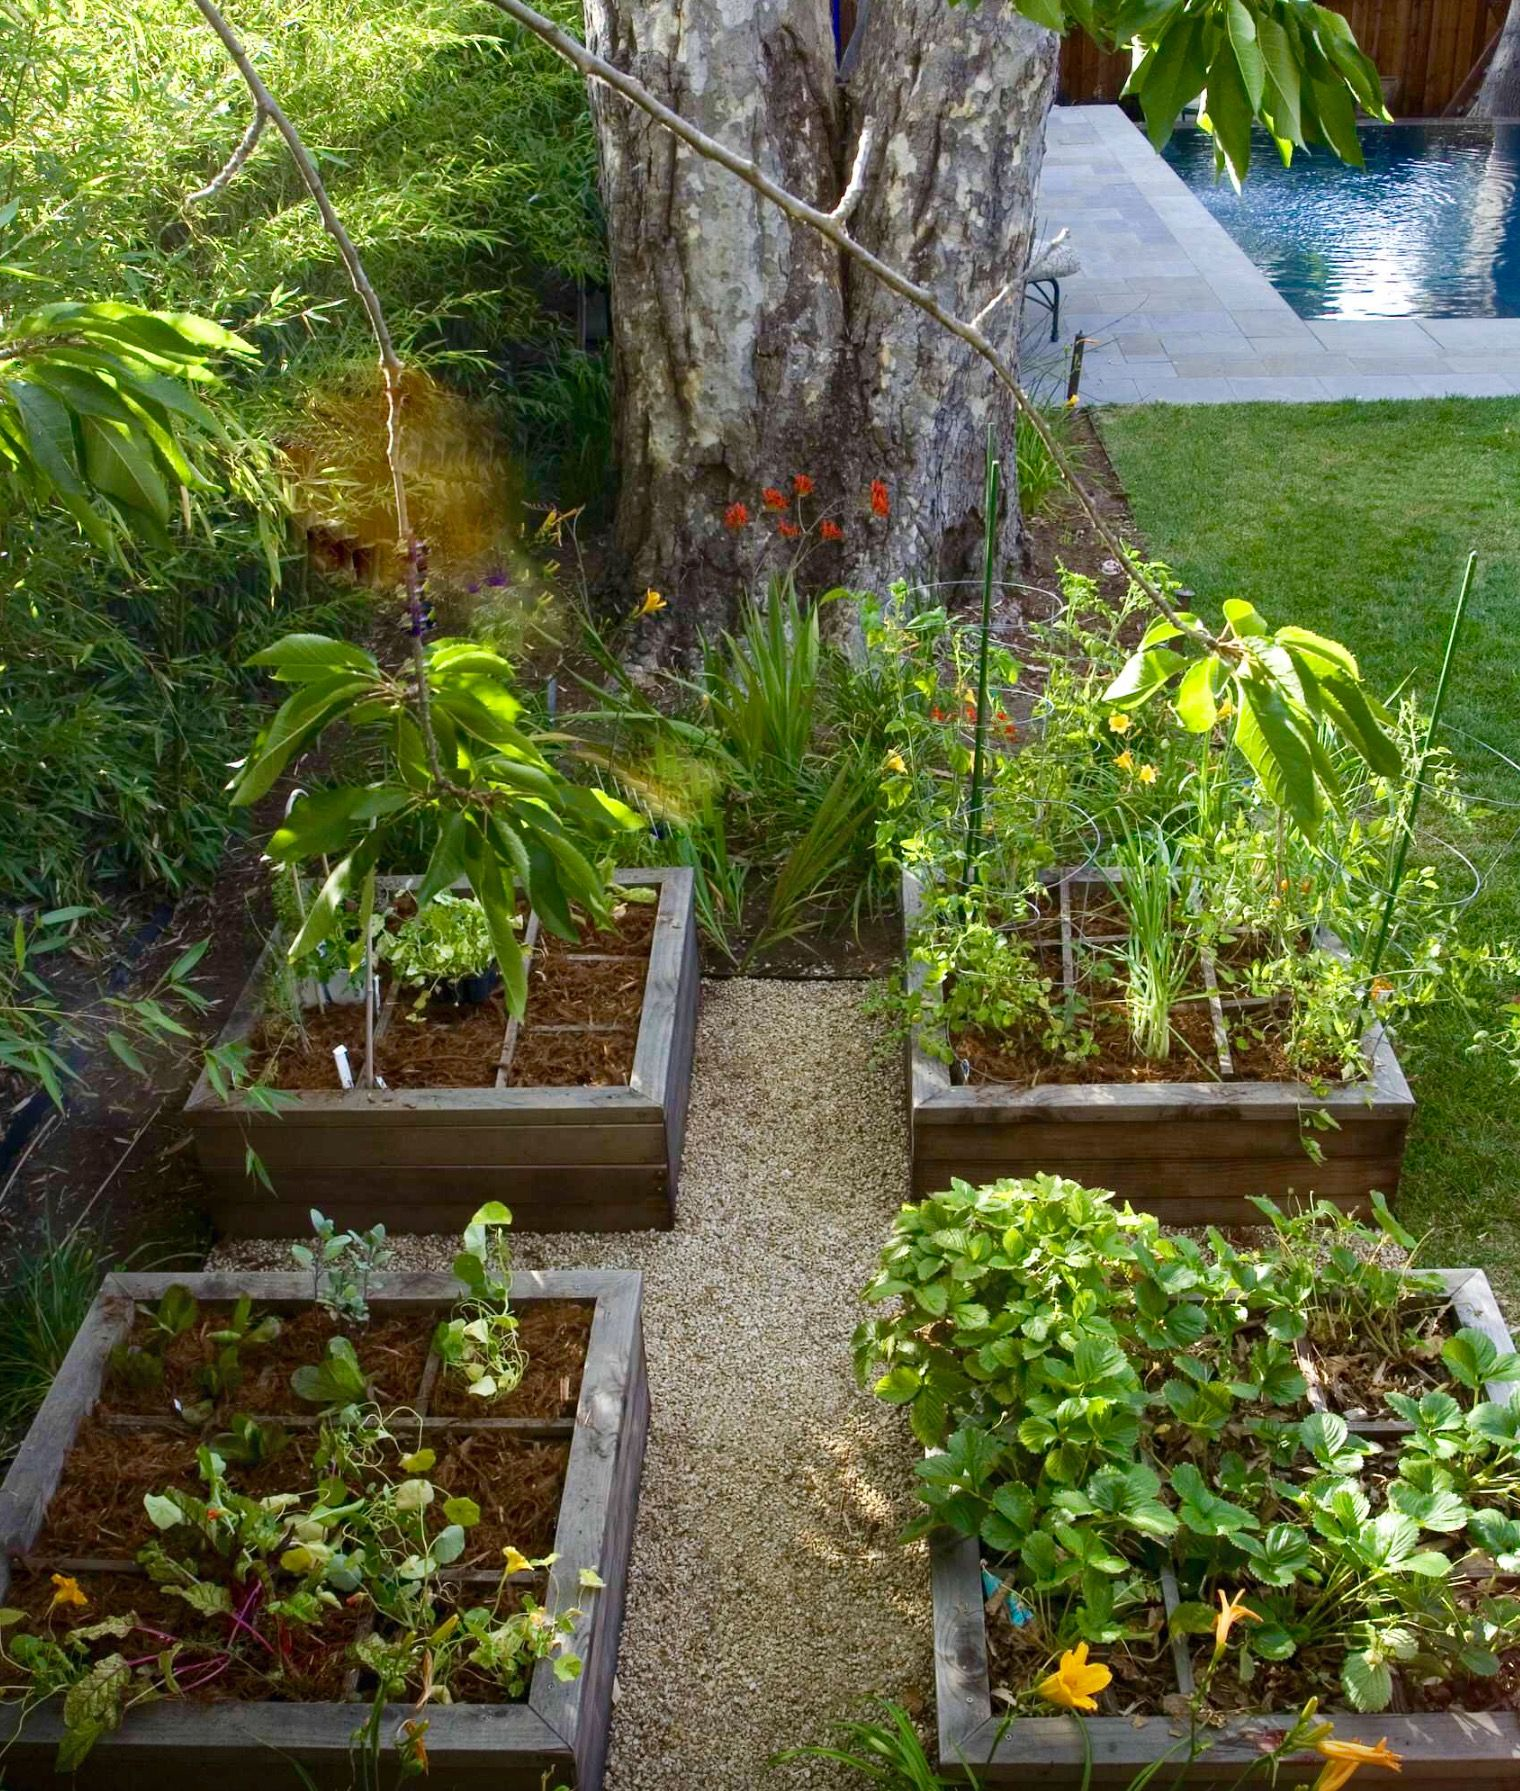 Pin by Fay F on Gardening | Garden layout, Backyard ...